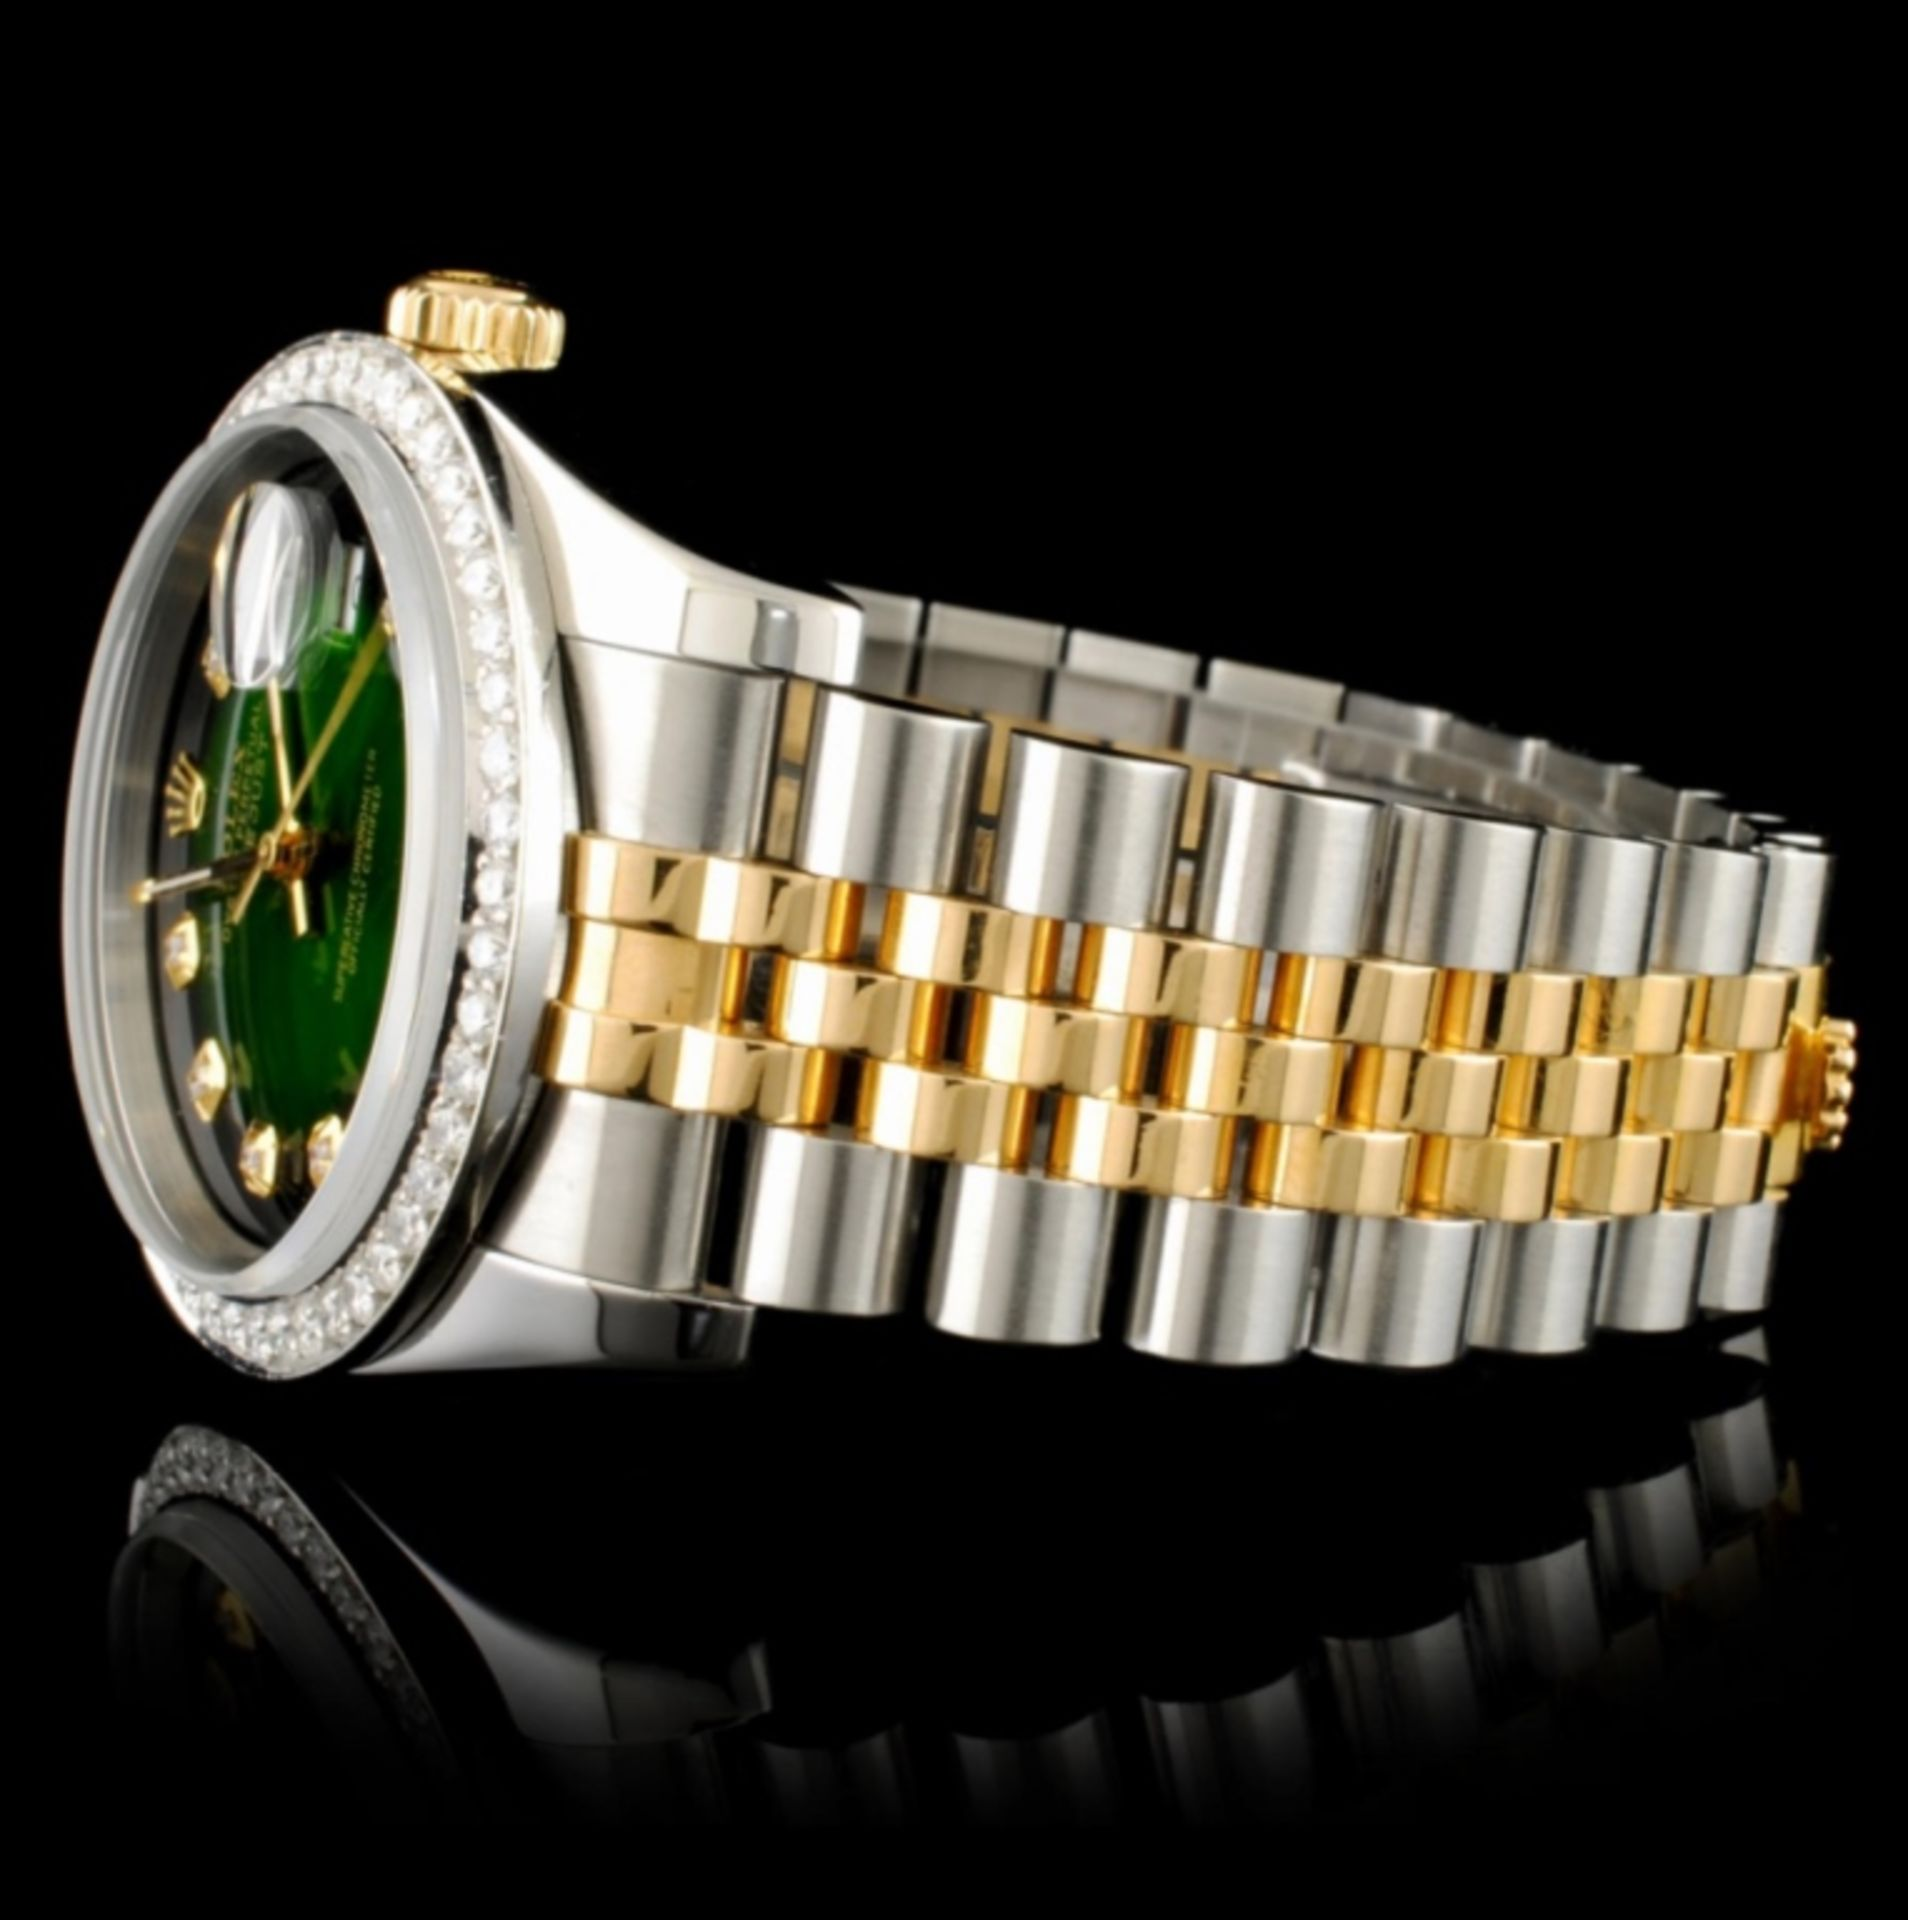 Rolex DateJust 116233 18K YG/SS Diamond 36MM Watch - Image 4 of 7